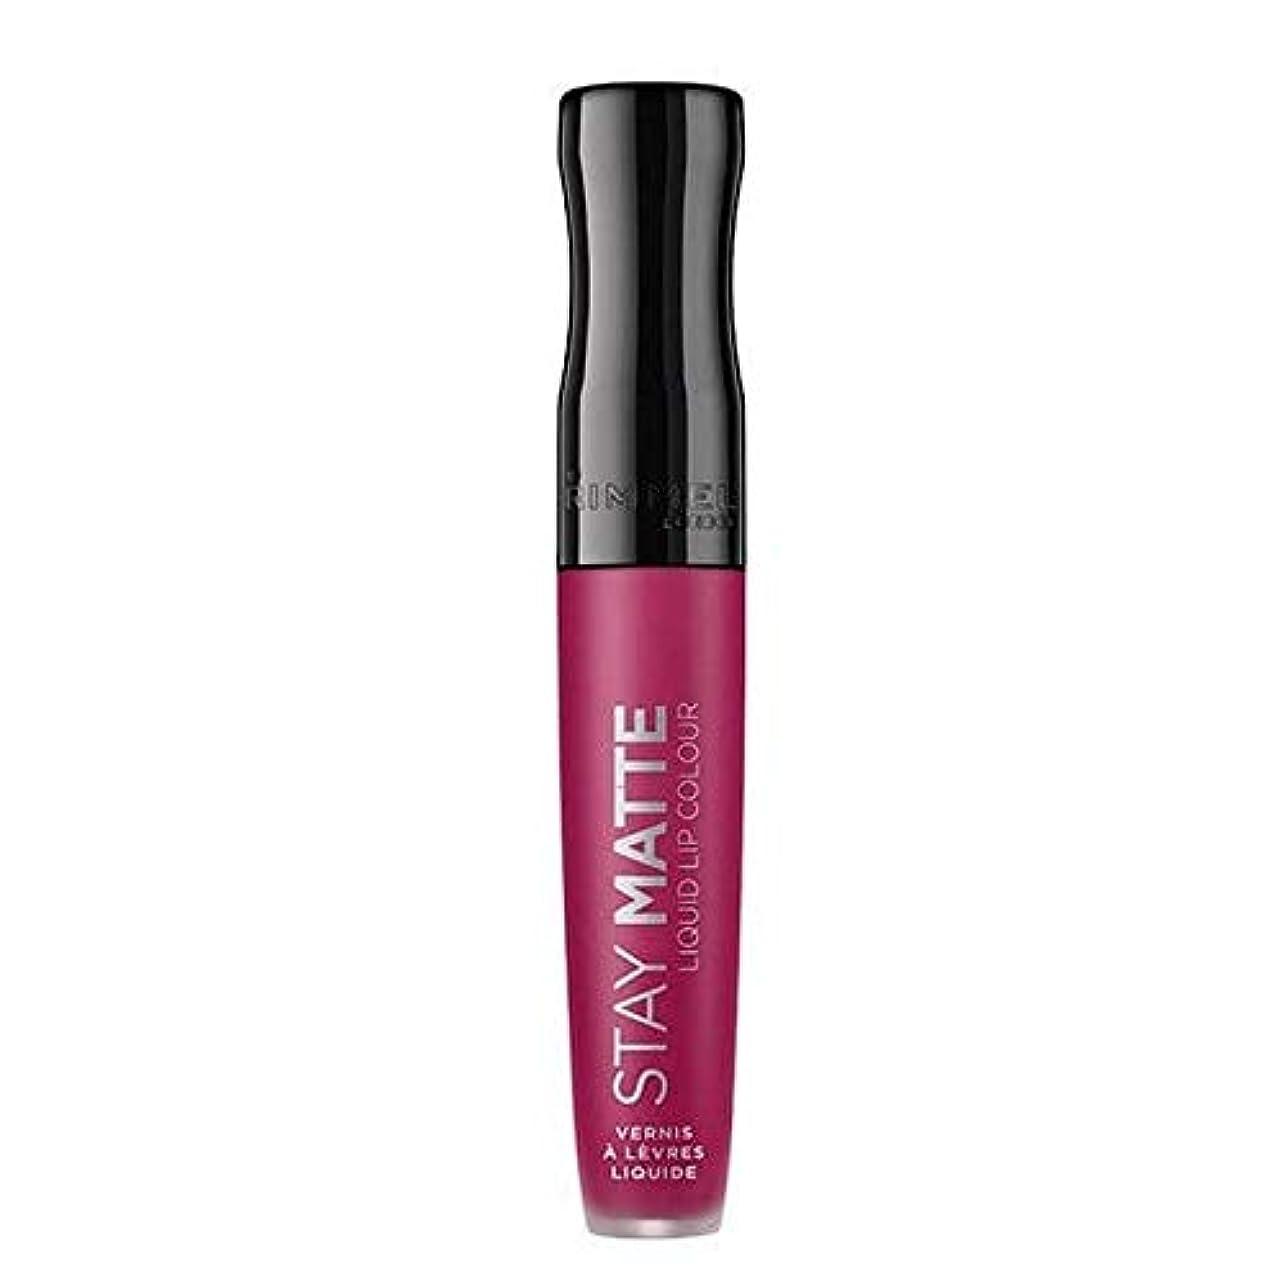 [Rimmel ] リンメルステイマット液状口紅ハートビート820 - Rimmel Stay Matte Liquid Lipstick Heartbeat 820 [並行輸入品]